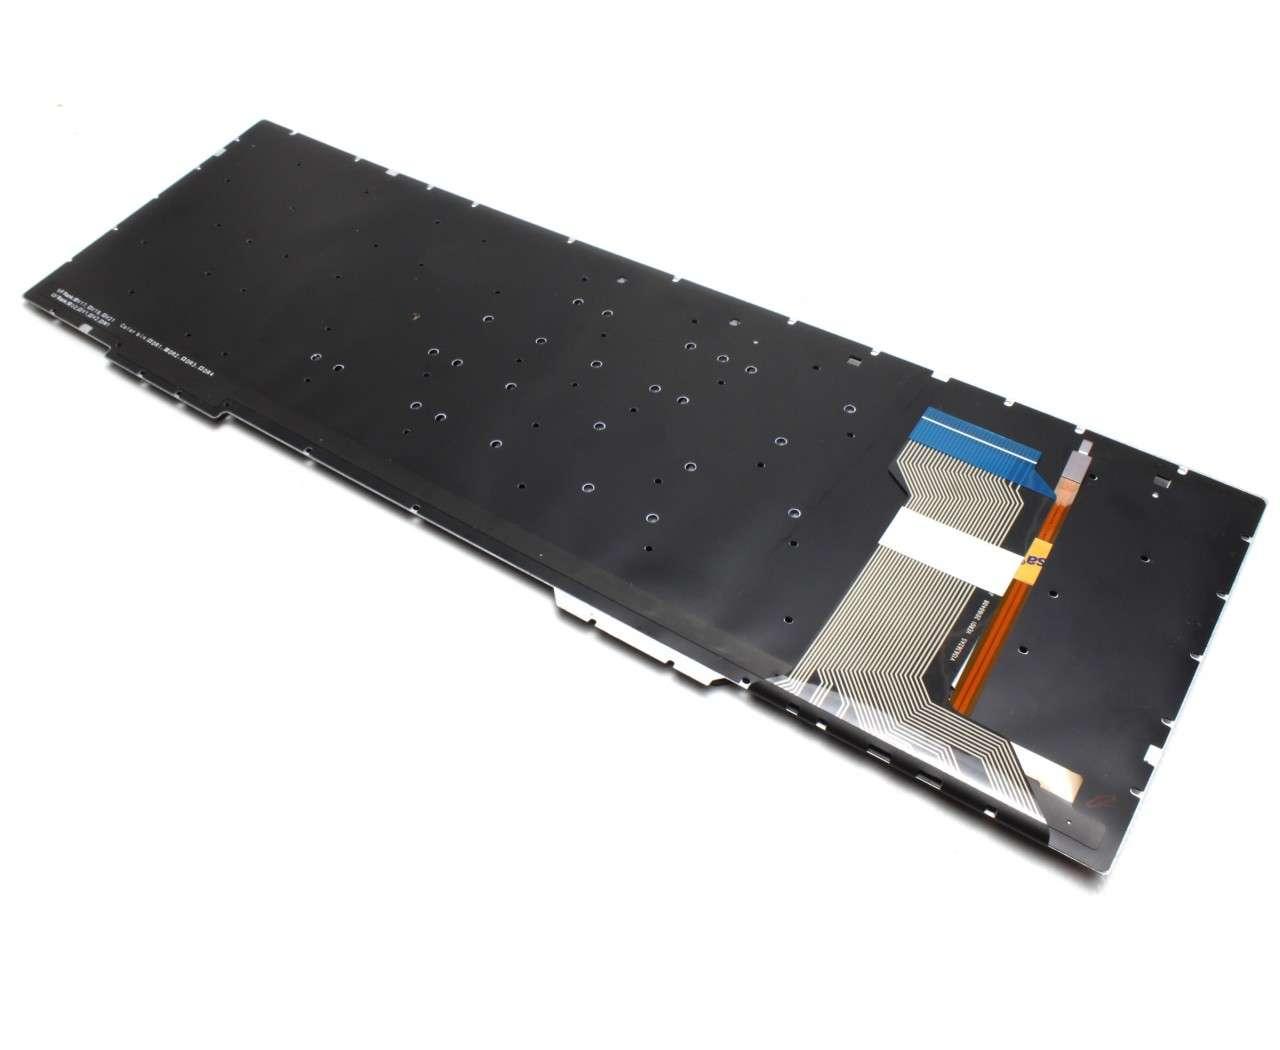 Tastatura Asus Rog GL753 iluminata layout US fara rama enter mic imagine powerlaptop.ro 2021